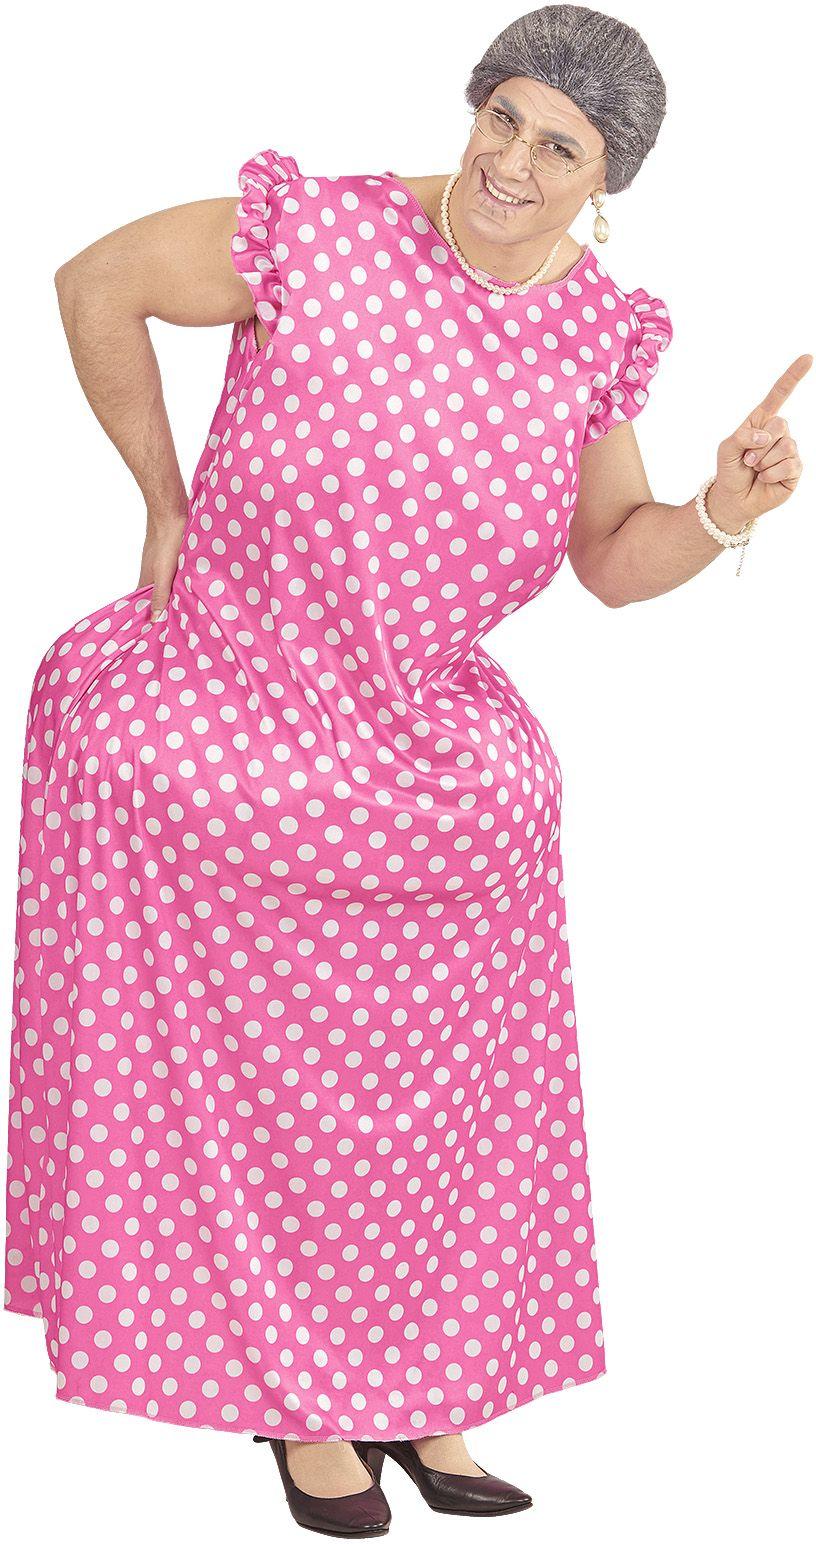 Gezette oma outfit One-size-volwassenen